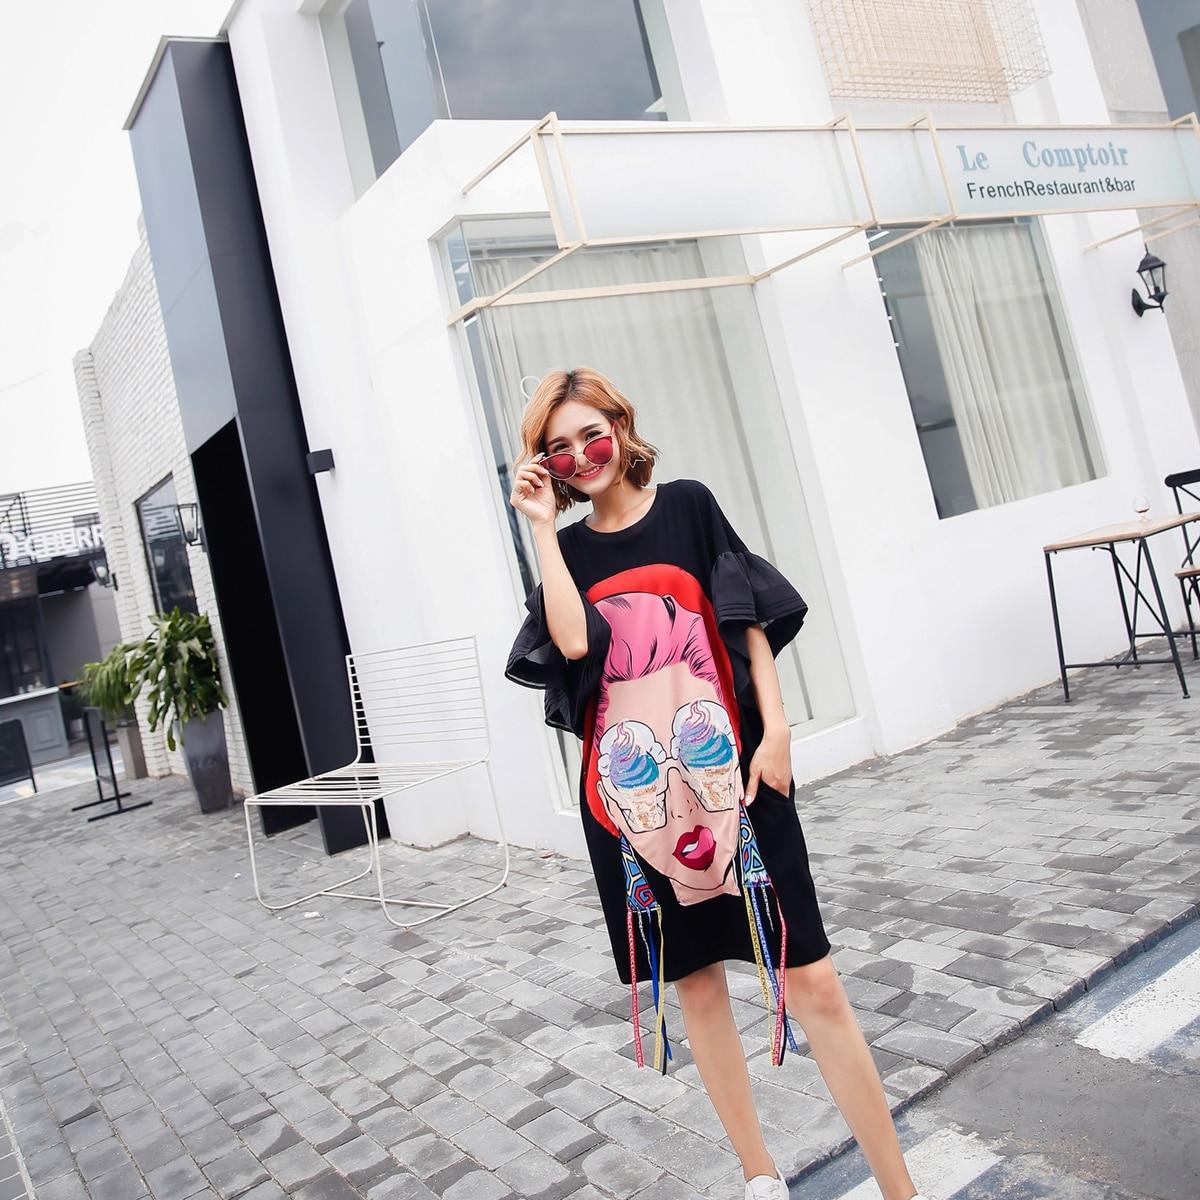 Vefadisa tシャツドレス白黒 夏の女性の漫画スパンコールドレス印刷非対称ドレスゆるいカジュアルなタッセル不規則な 送料無料